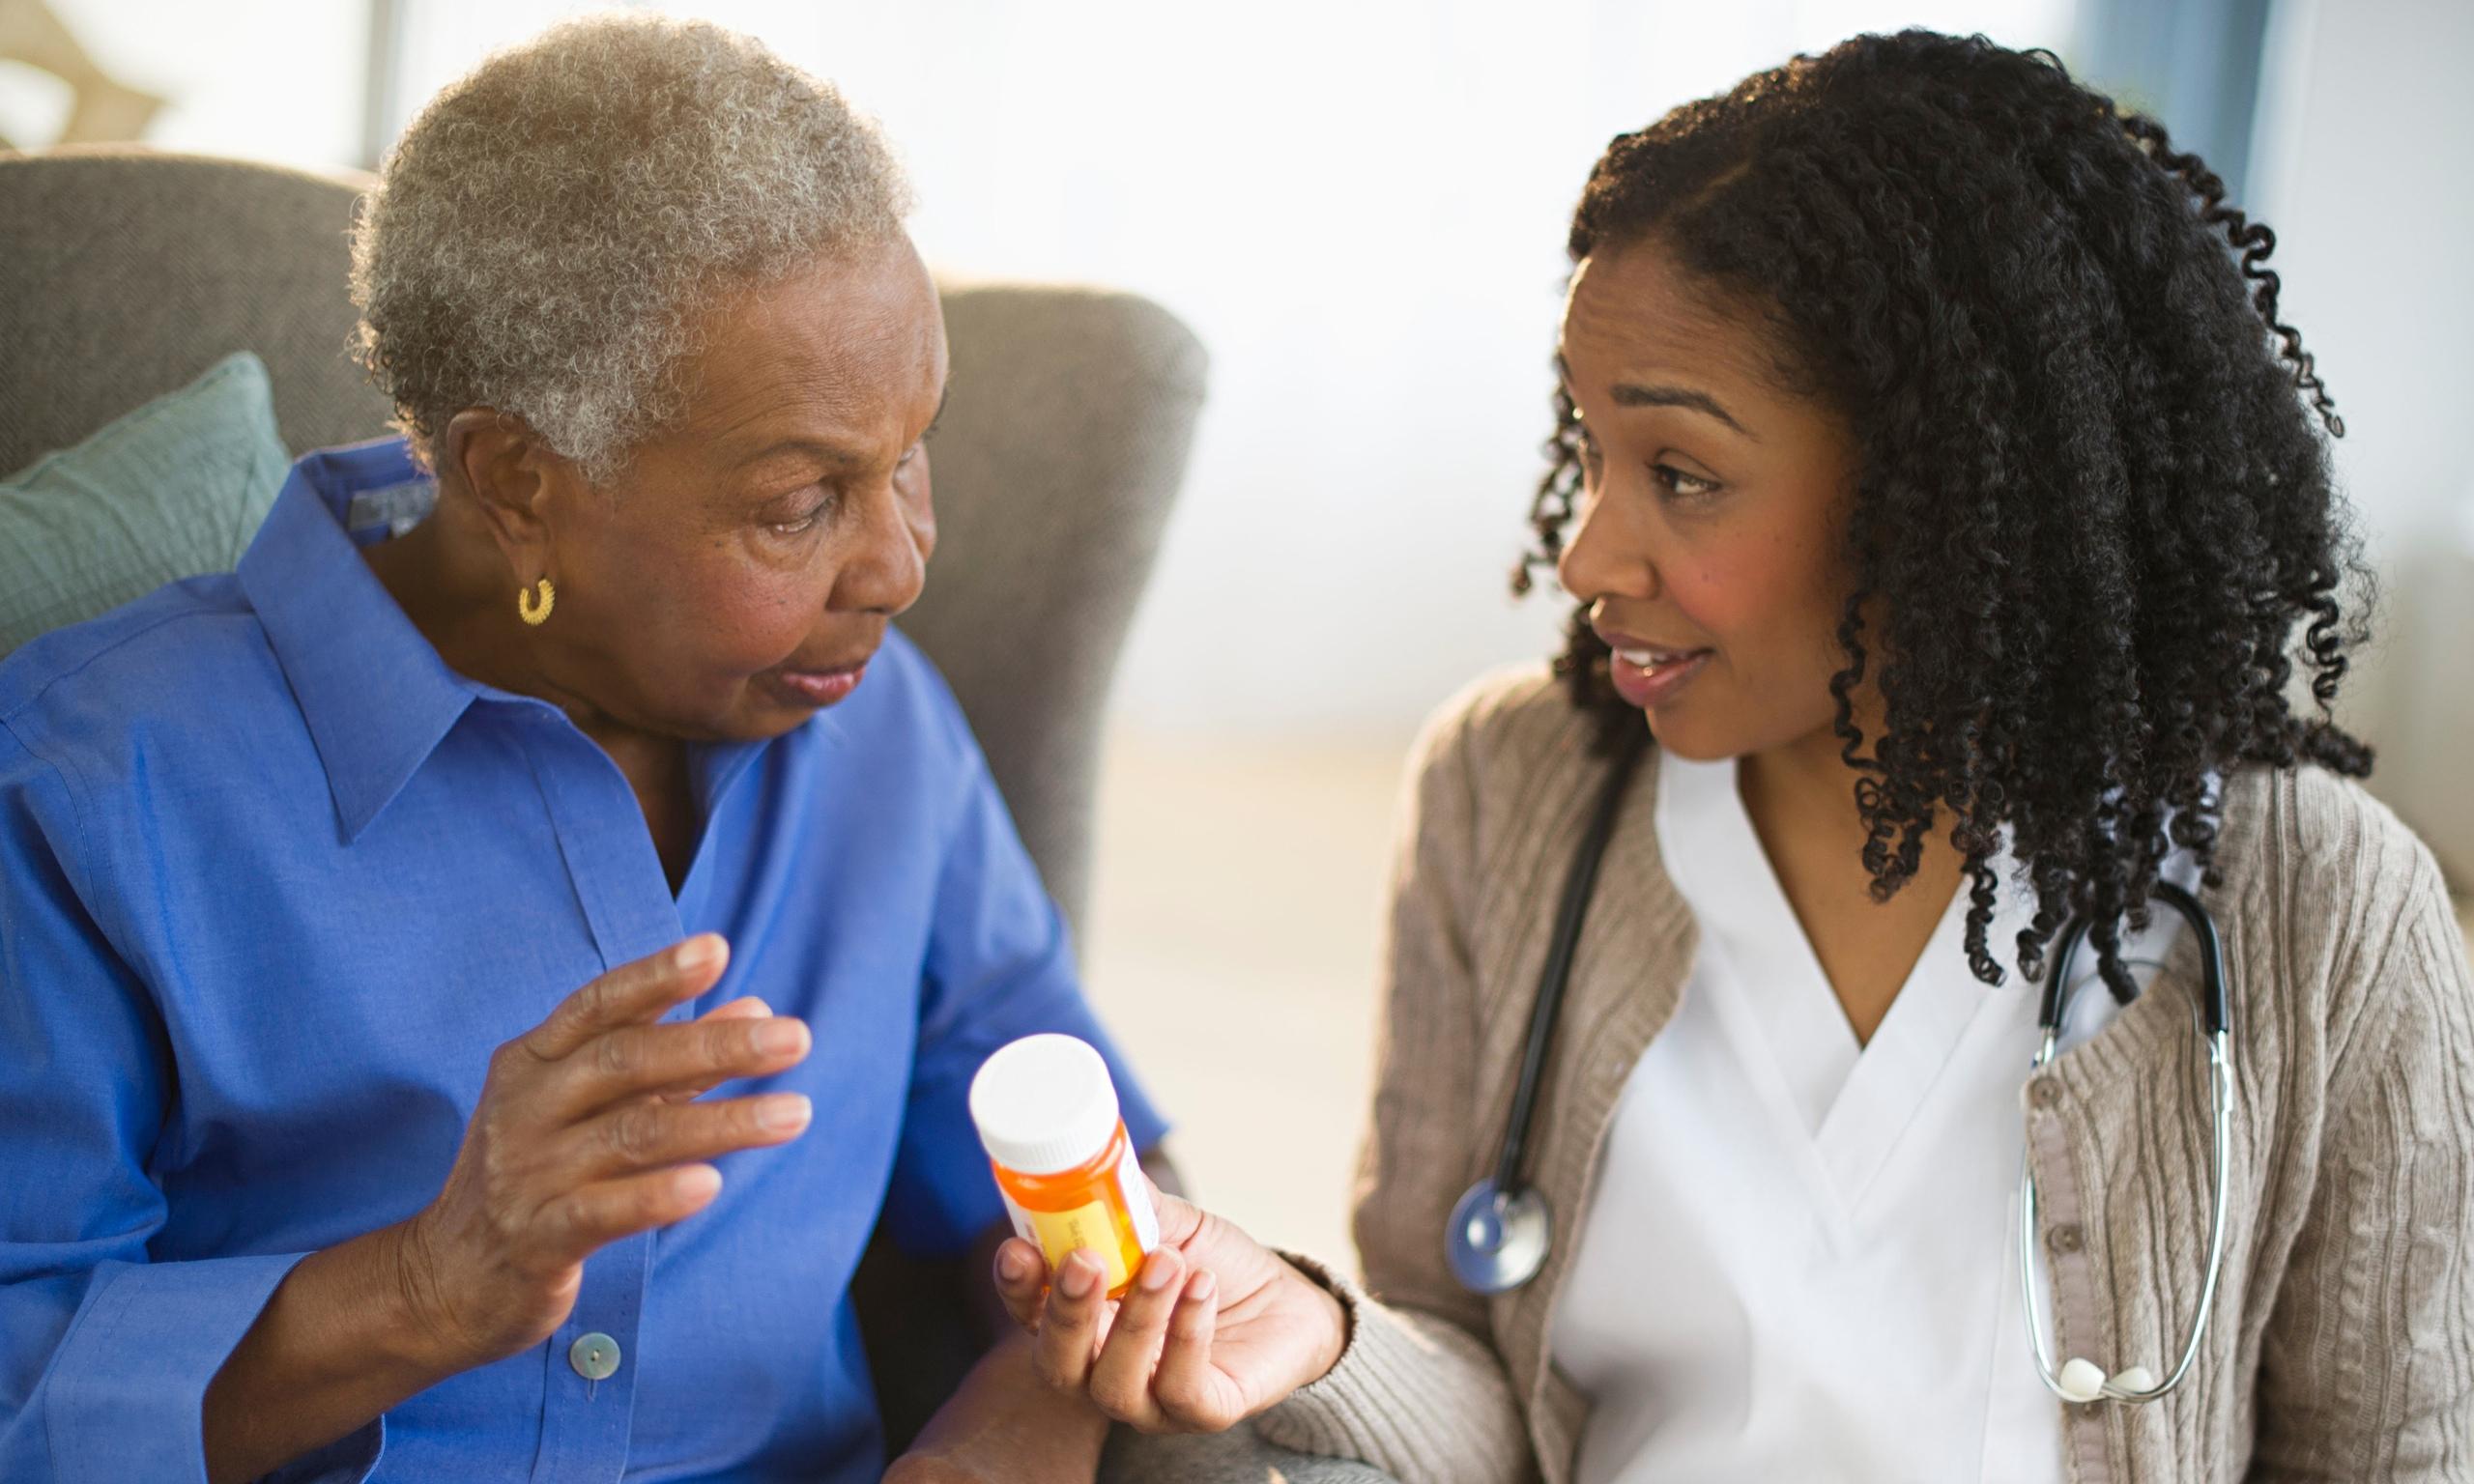 Nurse-explaining-medicati-011 ref the gu